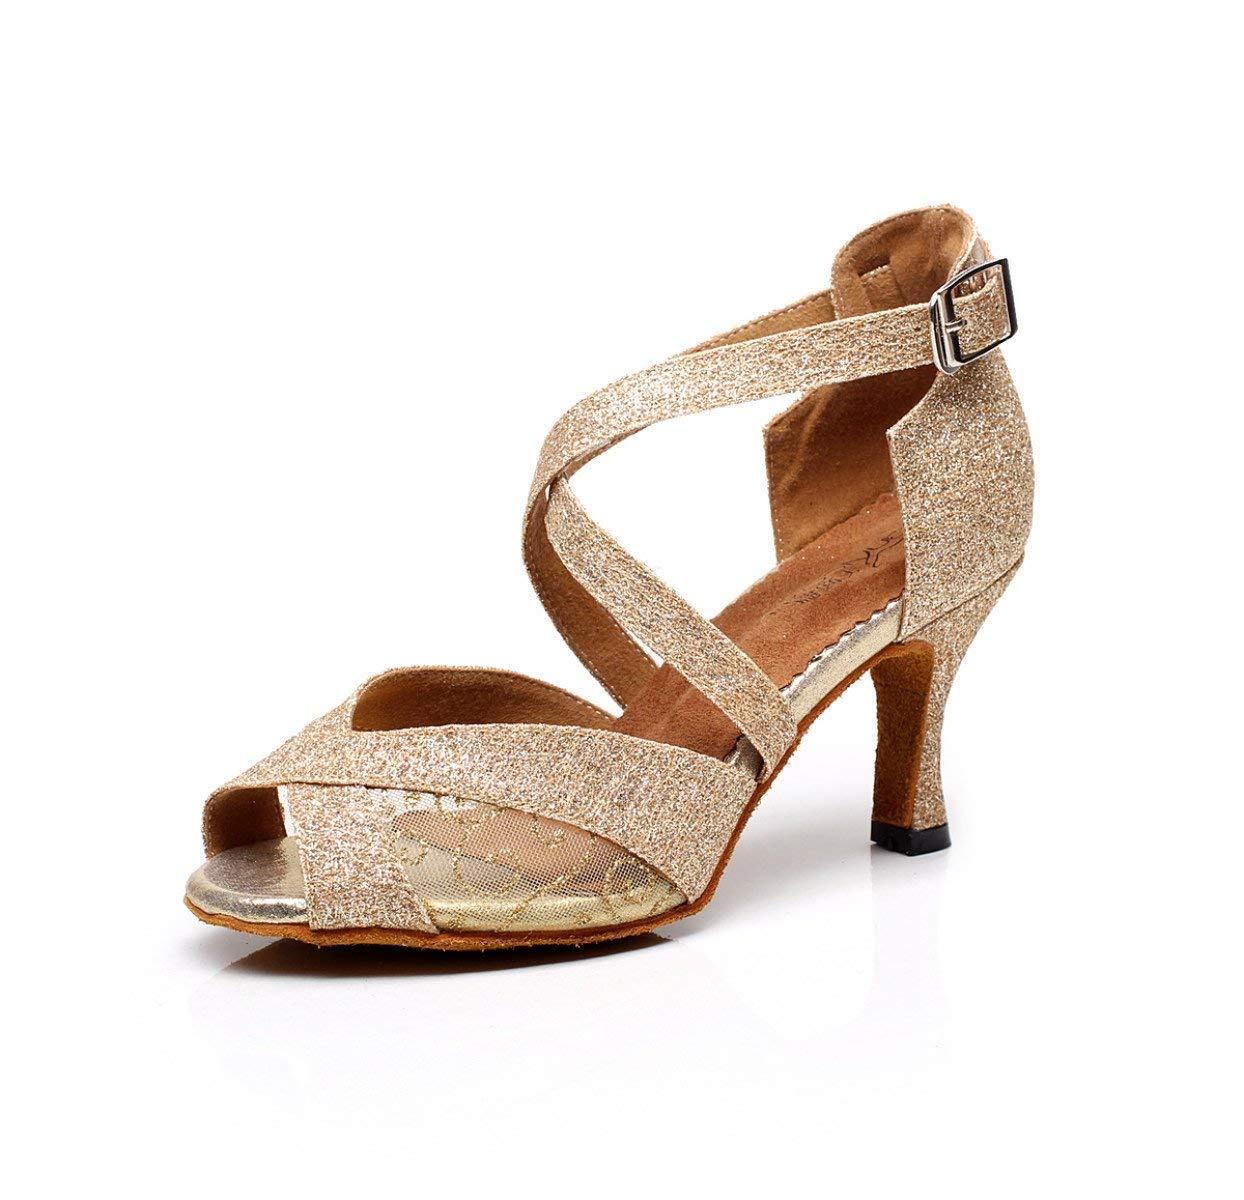 Frauen Peep Toe High Heel Satin Floral Salsa Tango Ballsaal Latin Ankle Wrap Tanzsandalen Gold-heeled6cm-UK5   EU37   Our38